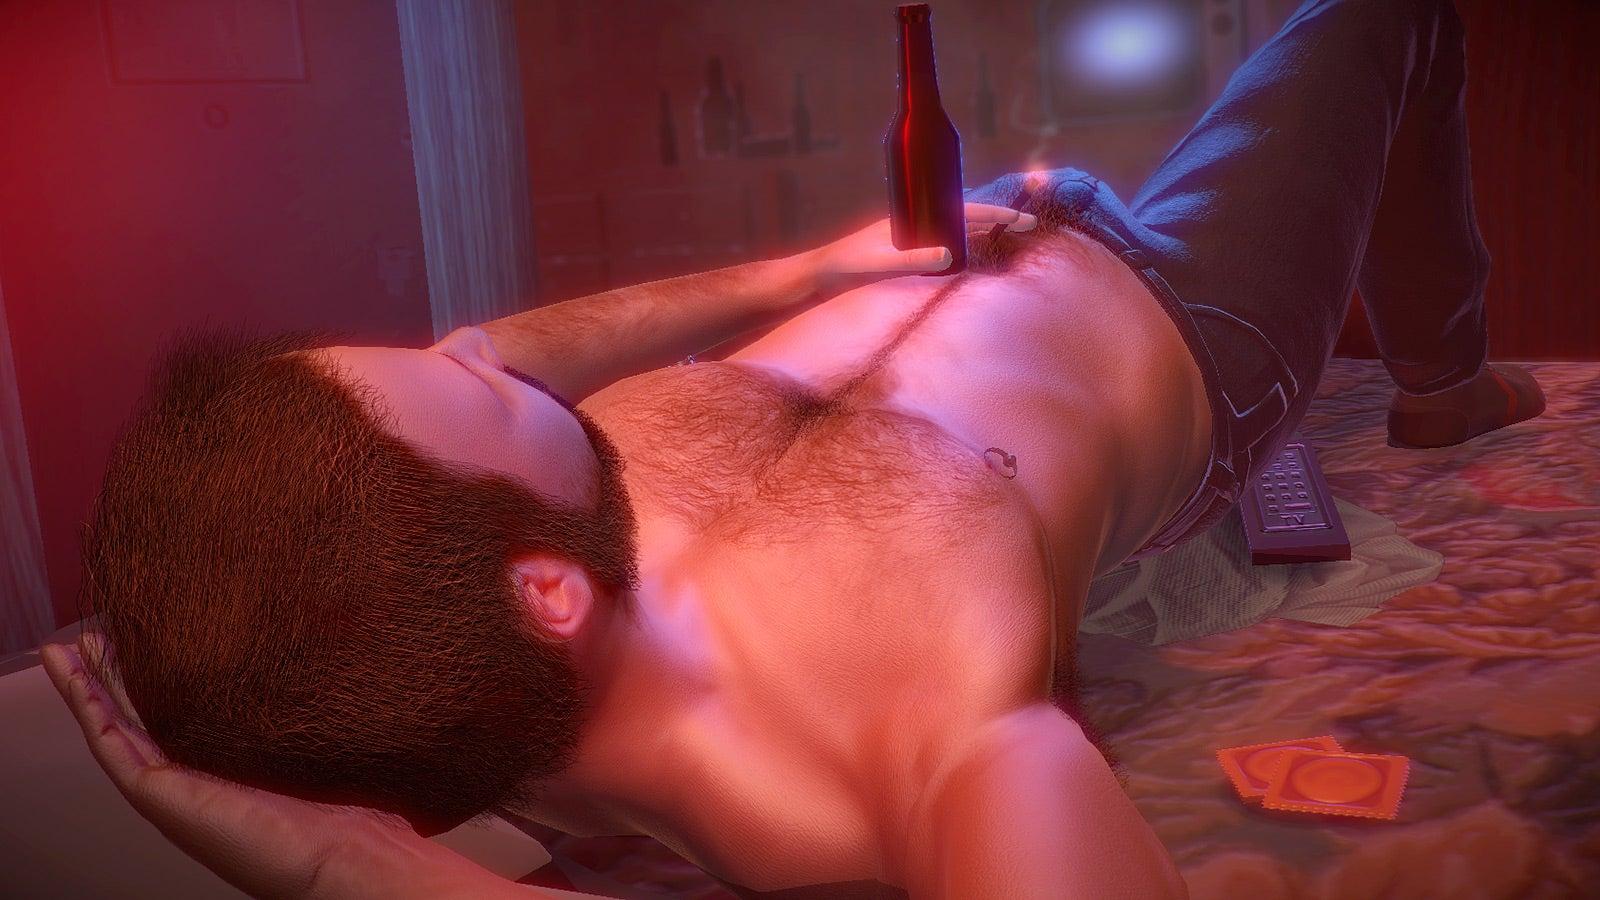 gratis knull filmer gay sex game